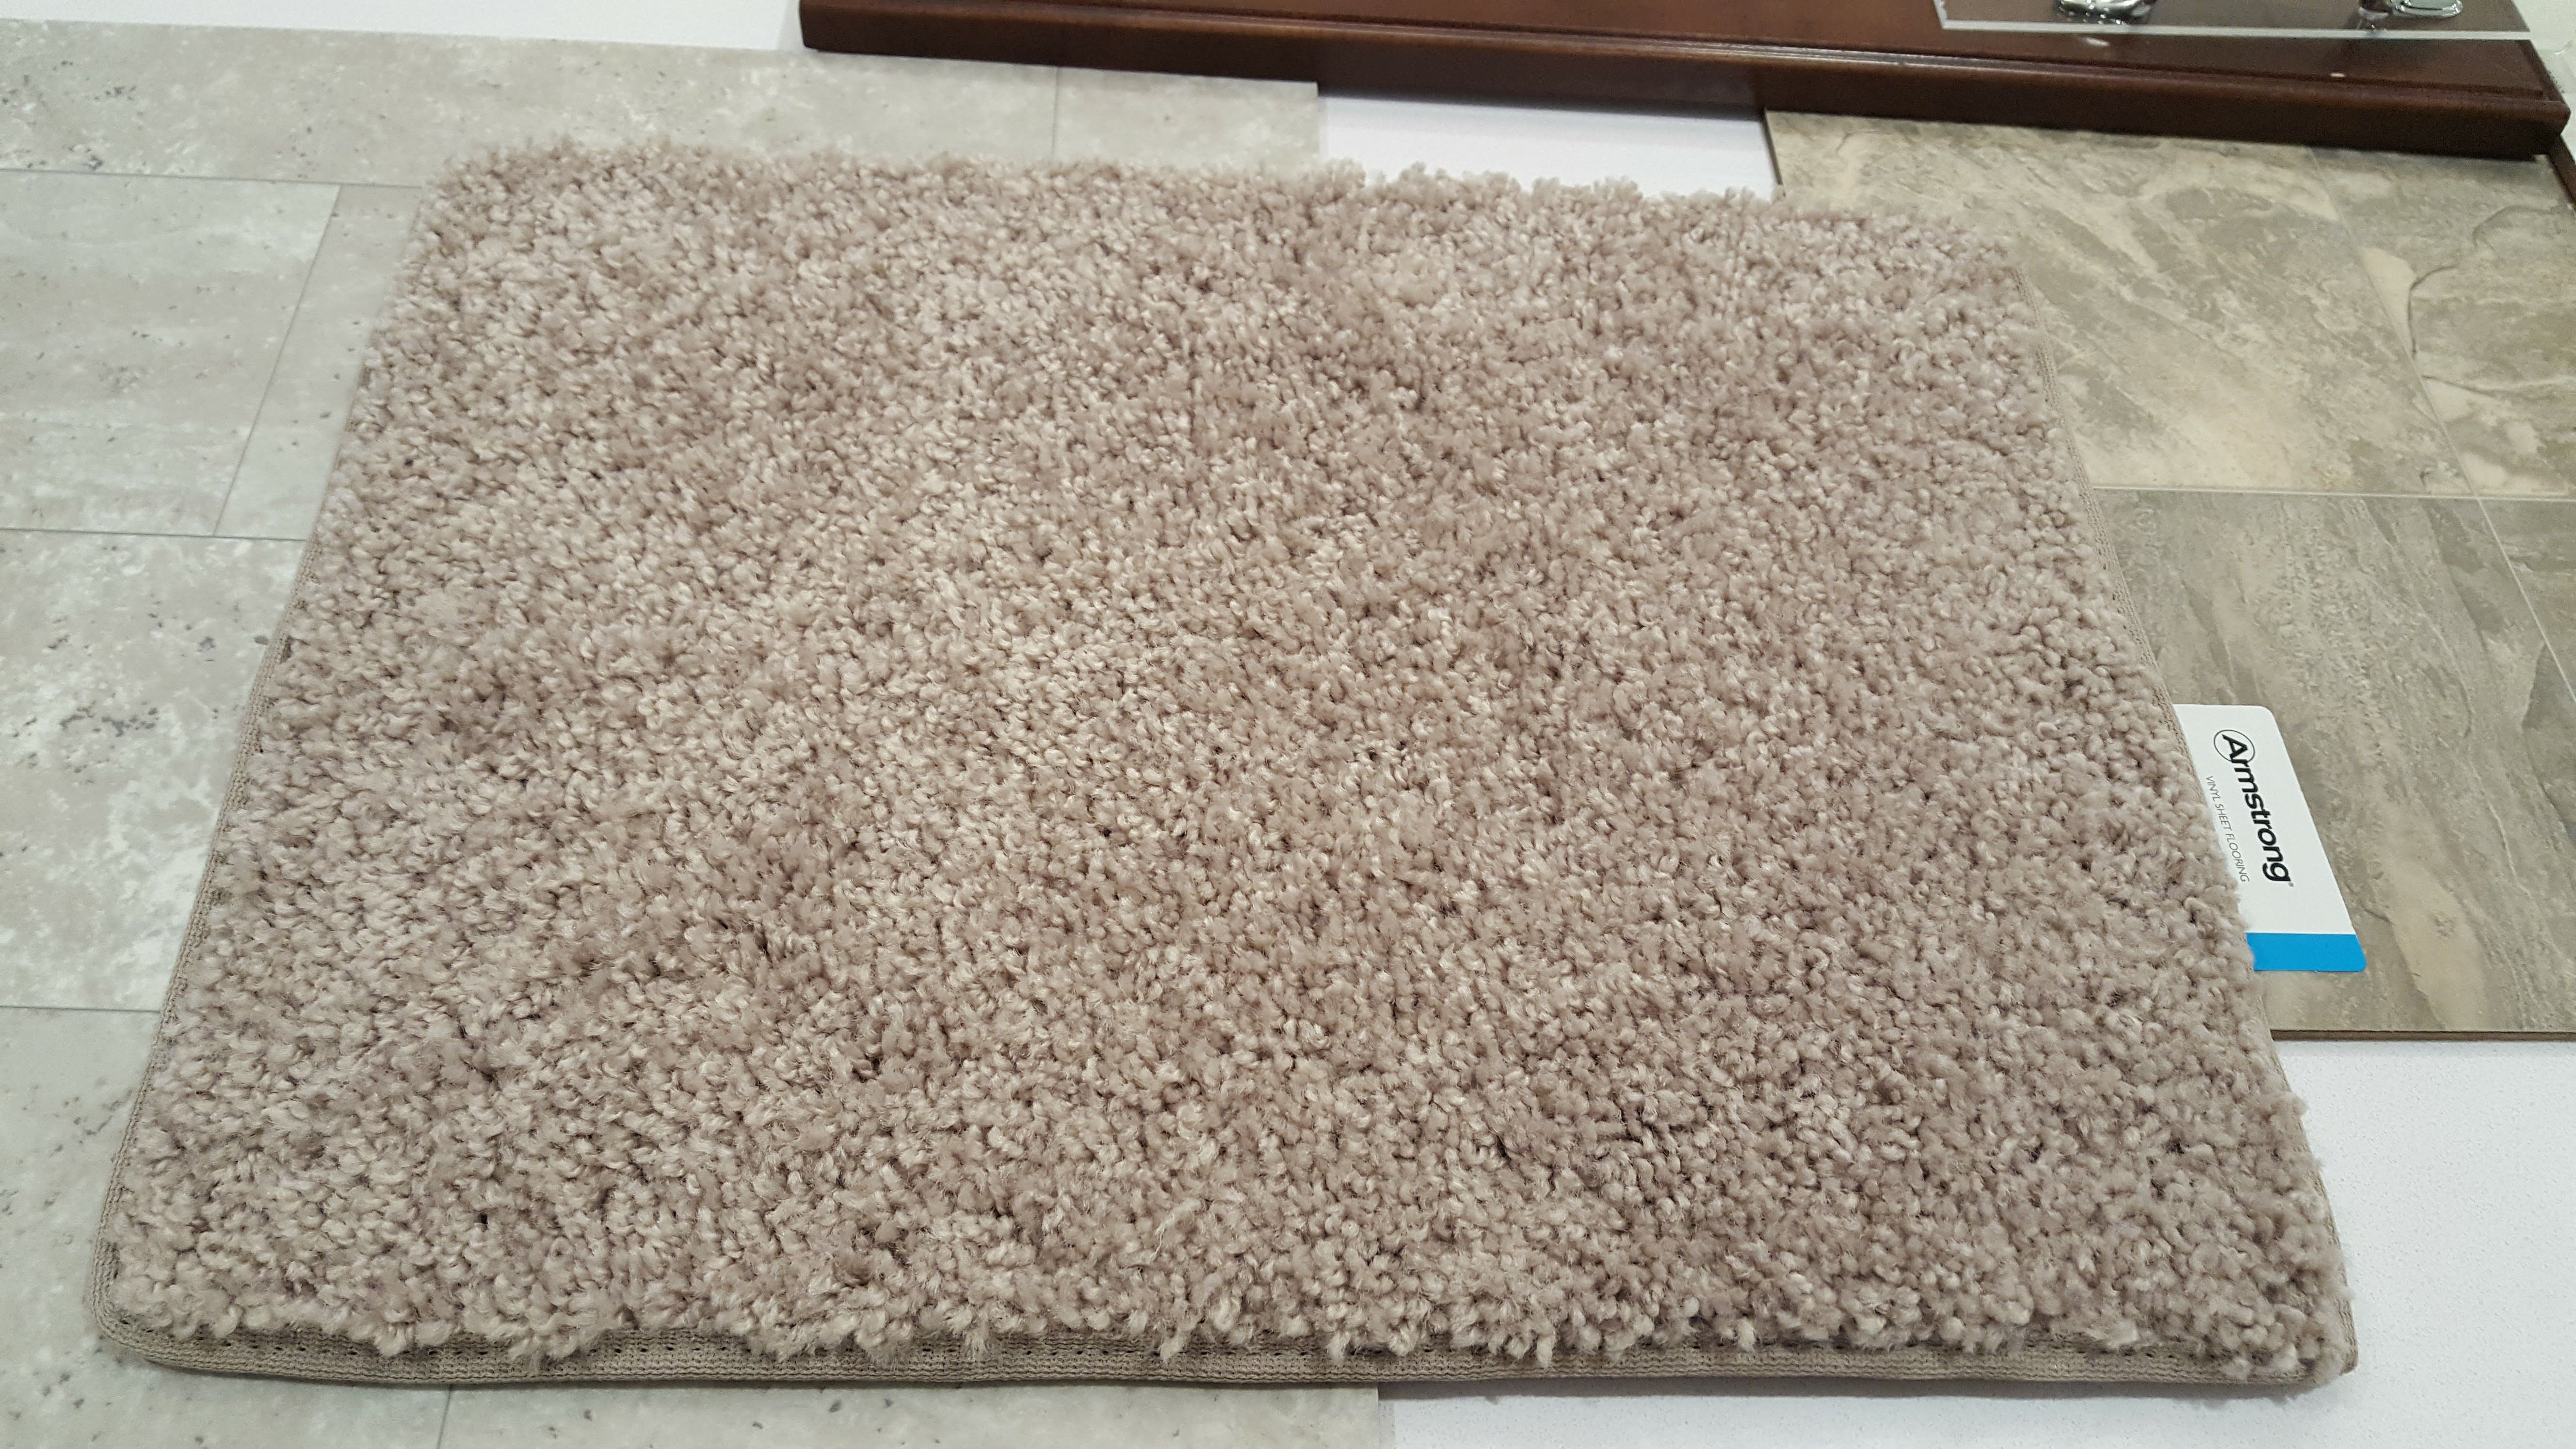 Carpet Thornton Taupestone With 1 2 6lb Padding Carpet Decor Home Decor